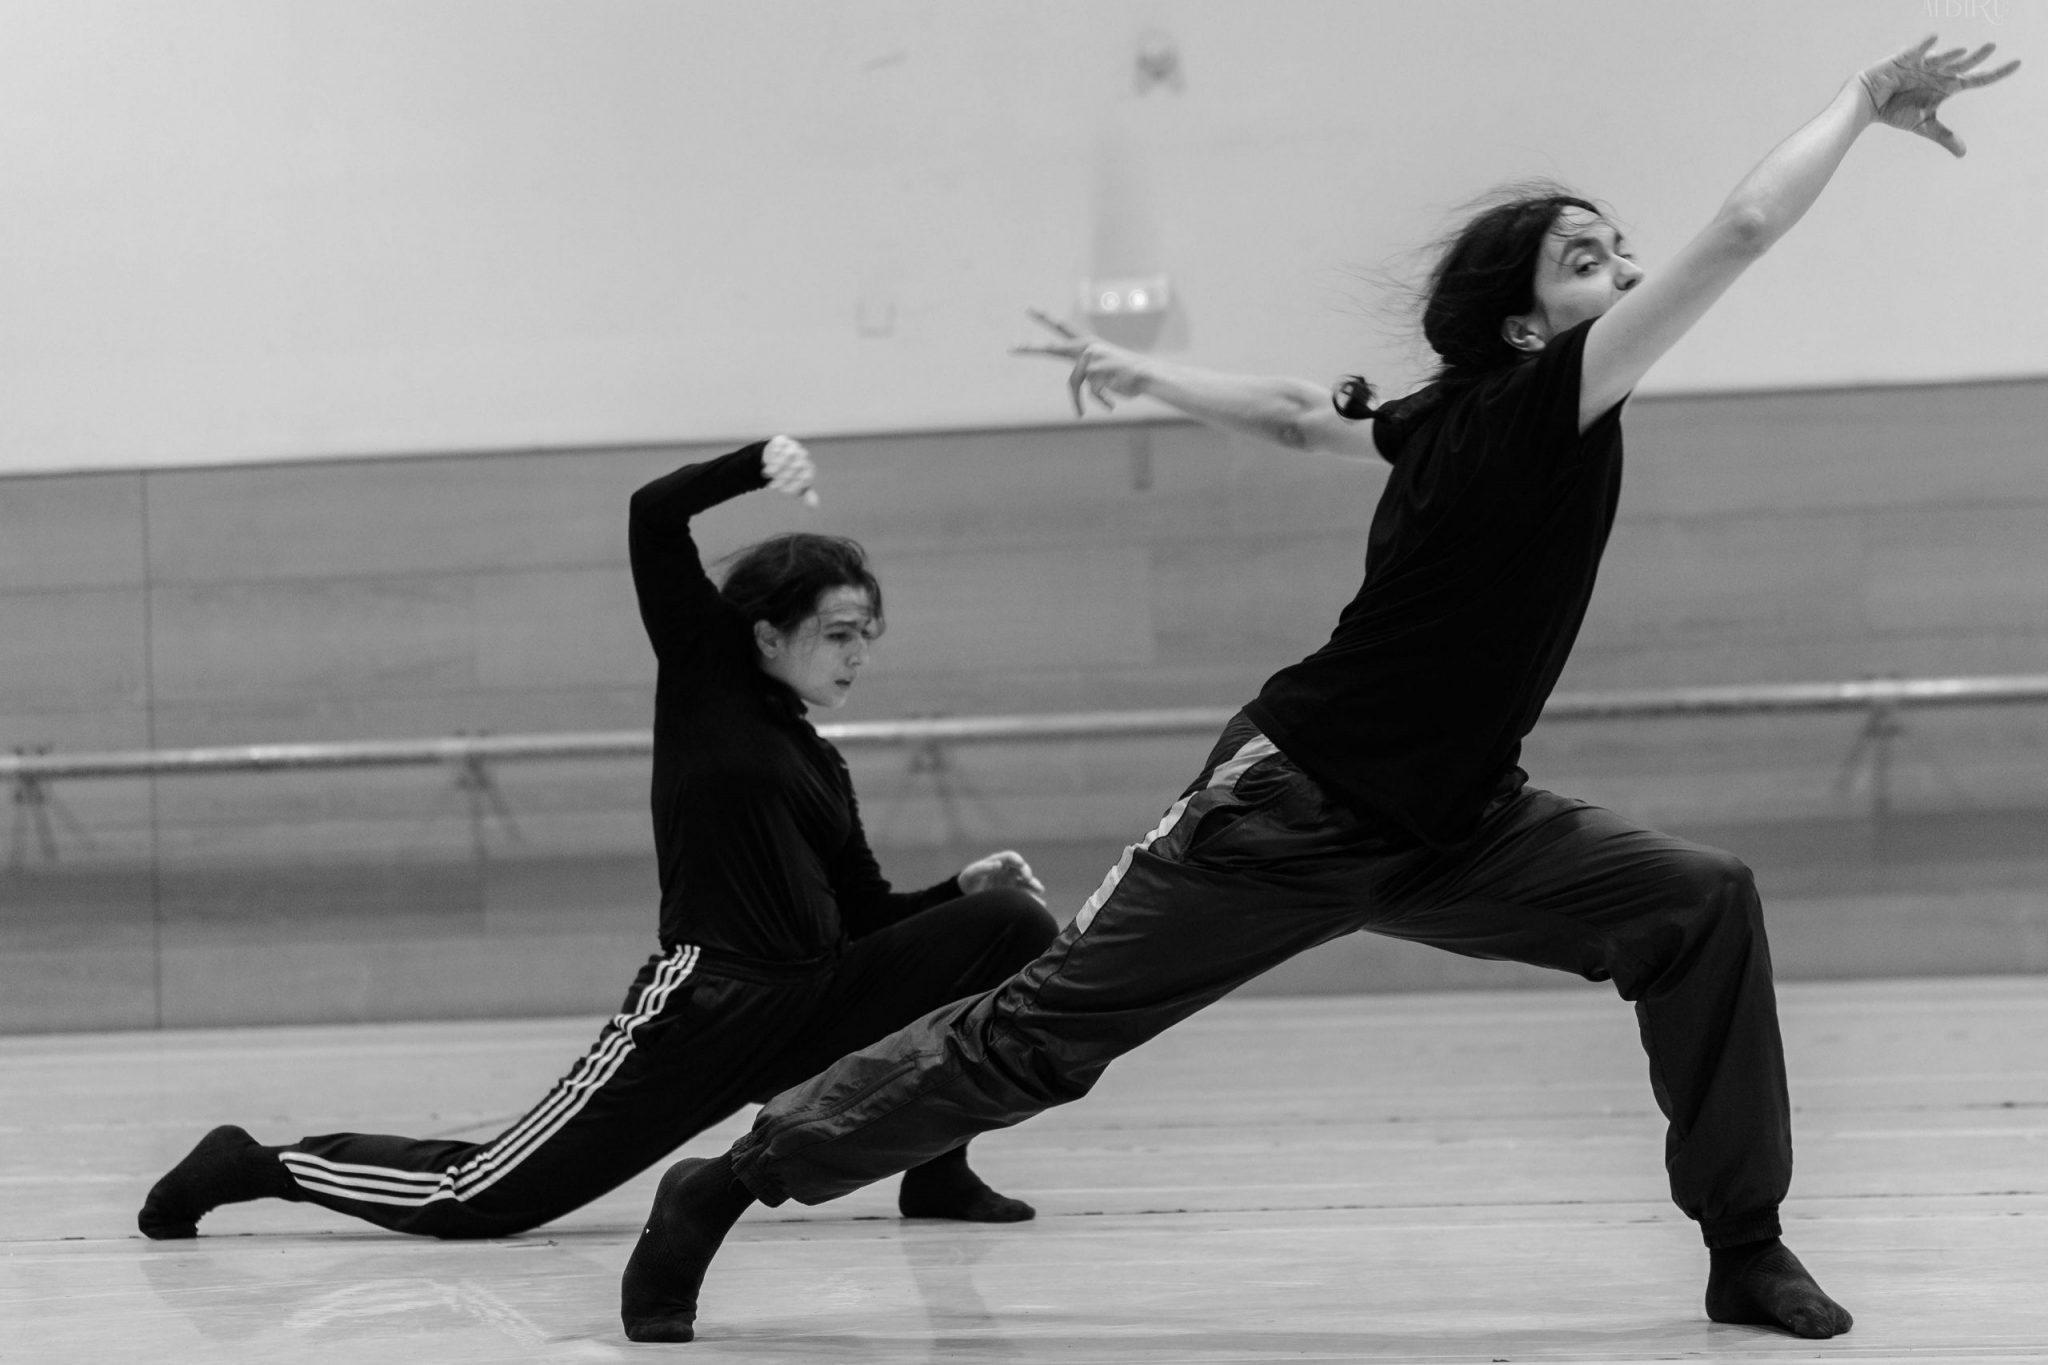 Doppelganger Contemporary Dancer Eduardo Vallejo Pinto